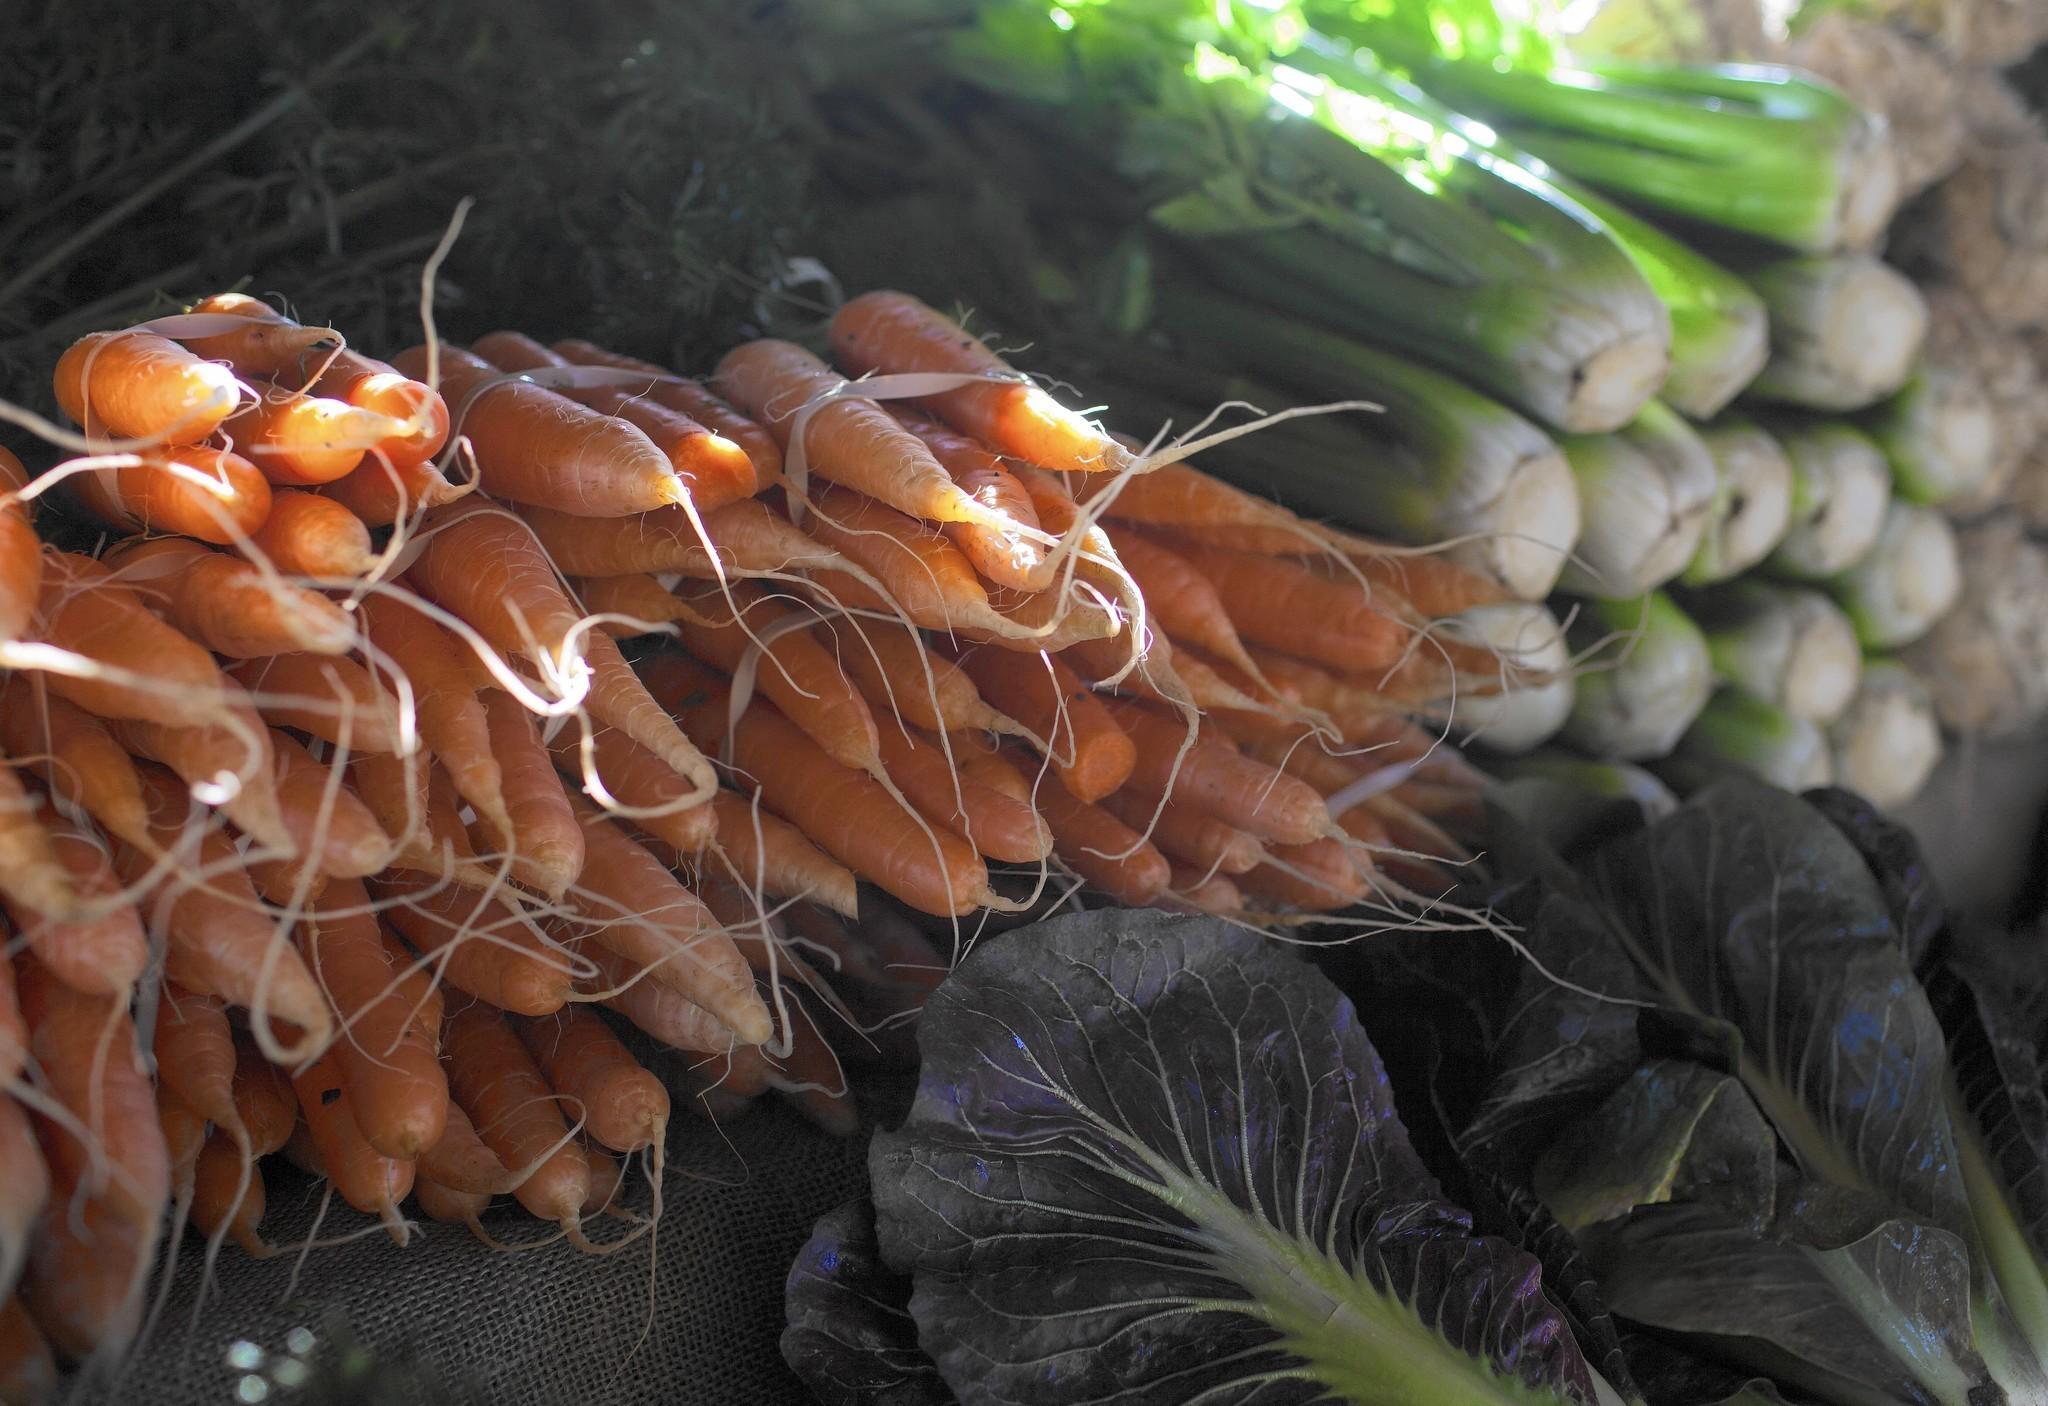 Asian citrus psyllid proposal worries organic farmers